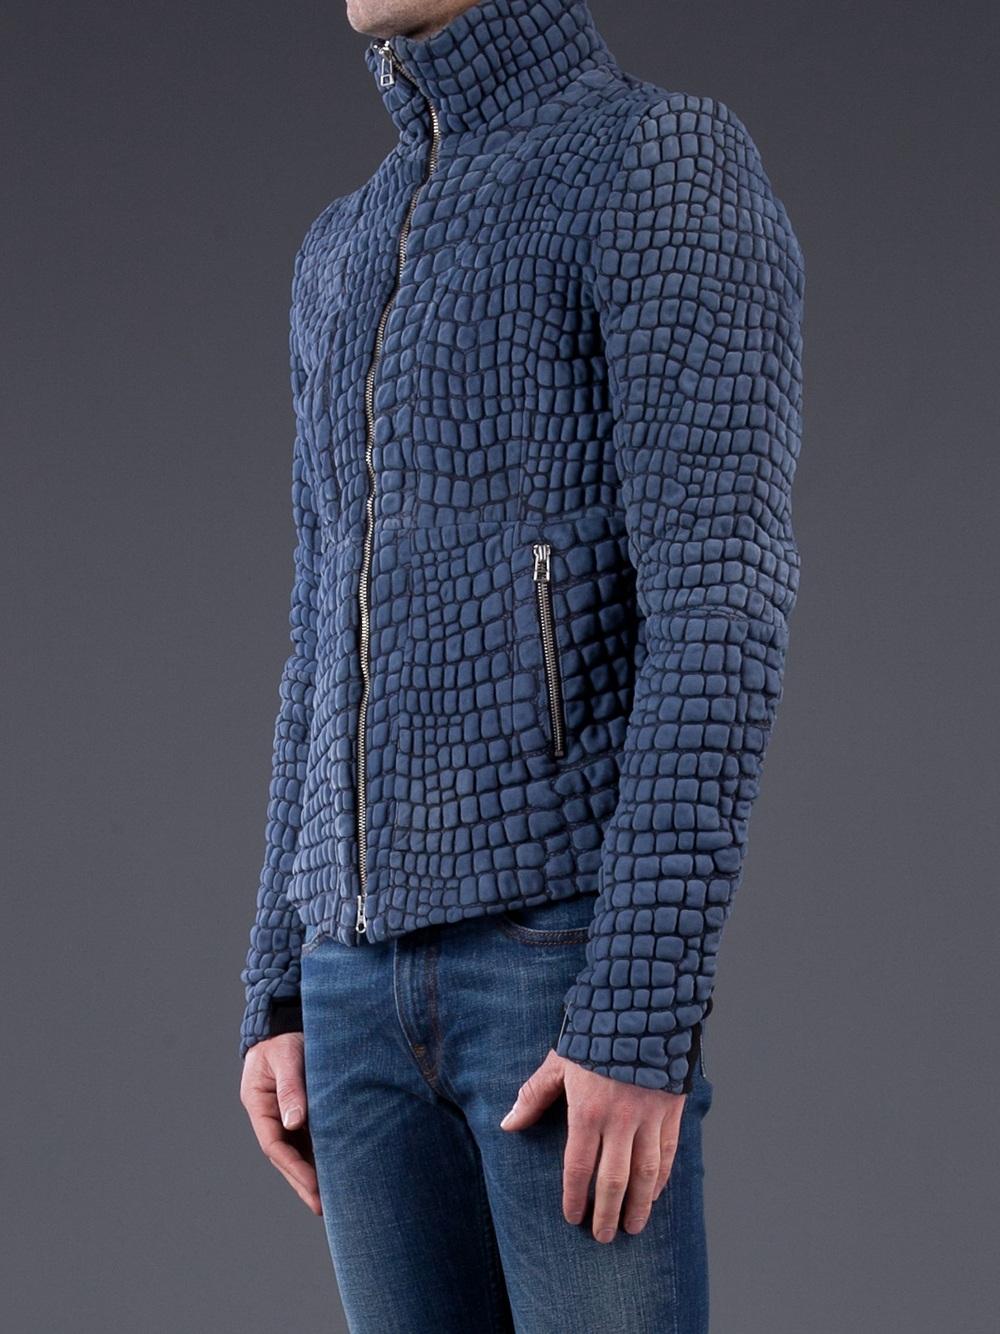 Unconditional Snake Skin Jacket In Blue For Men Lyst